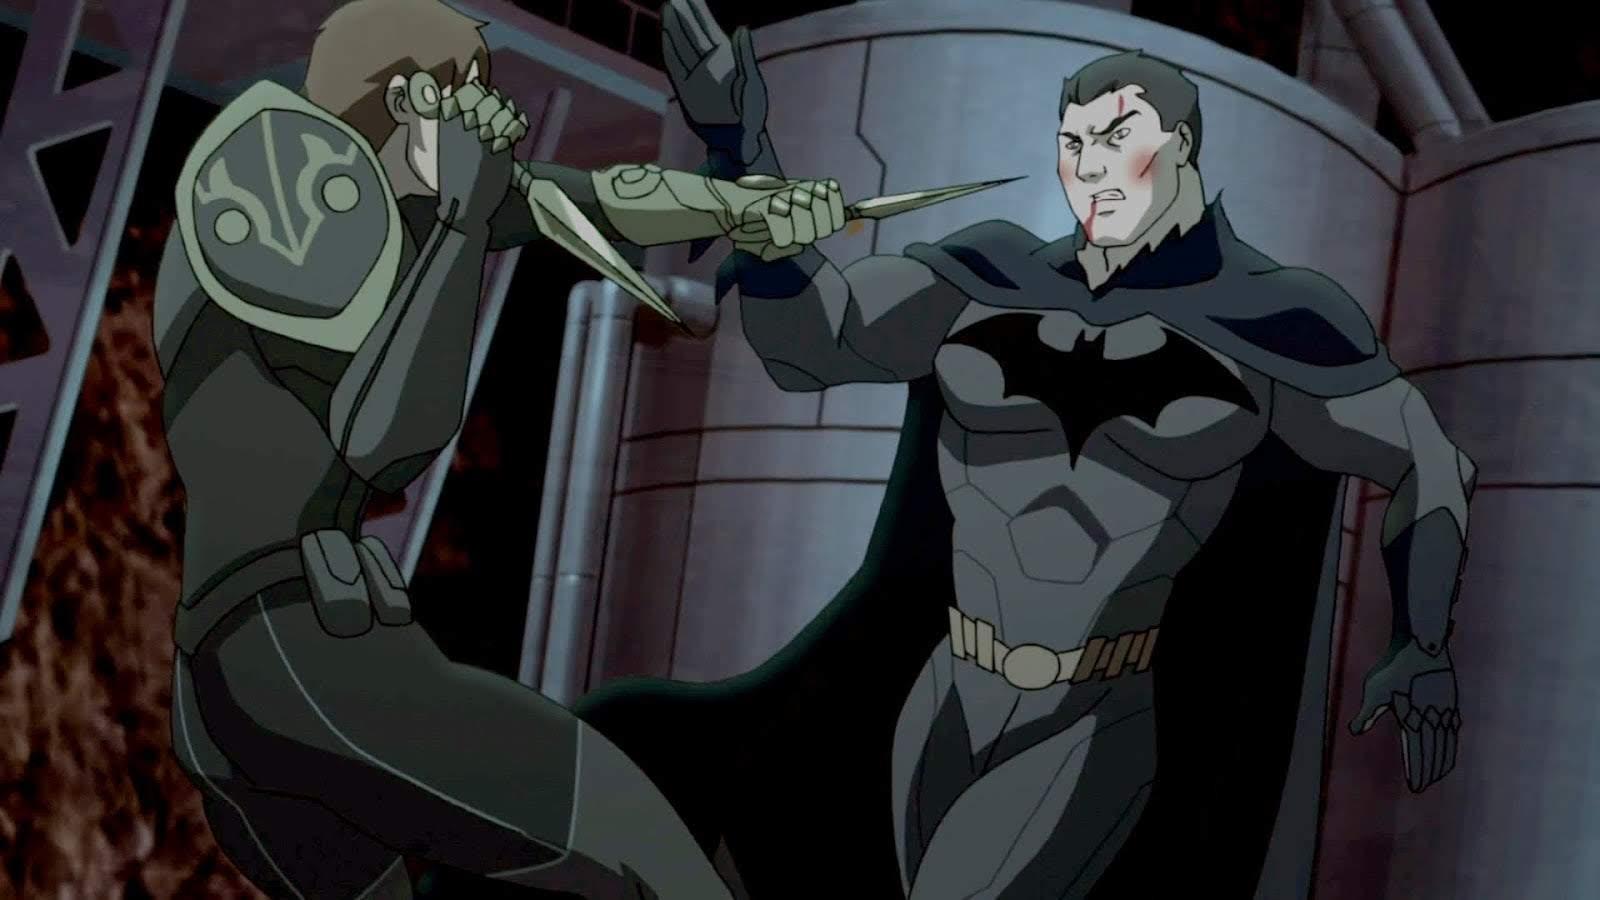 DC & Warner Bros Caught Plagiarizing Youtuber ? : ワーナー・DC のヒーロー・アニメ「バットマン vs. ロビン」に、パクリ疑惑が浮上 ? !